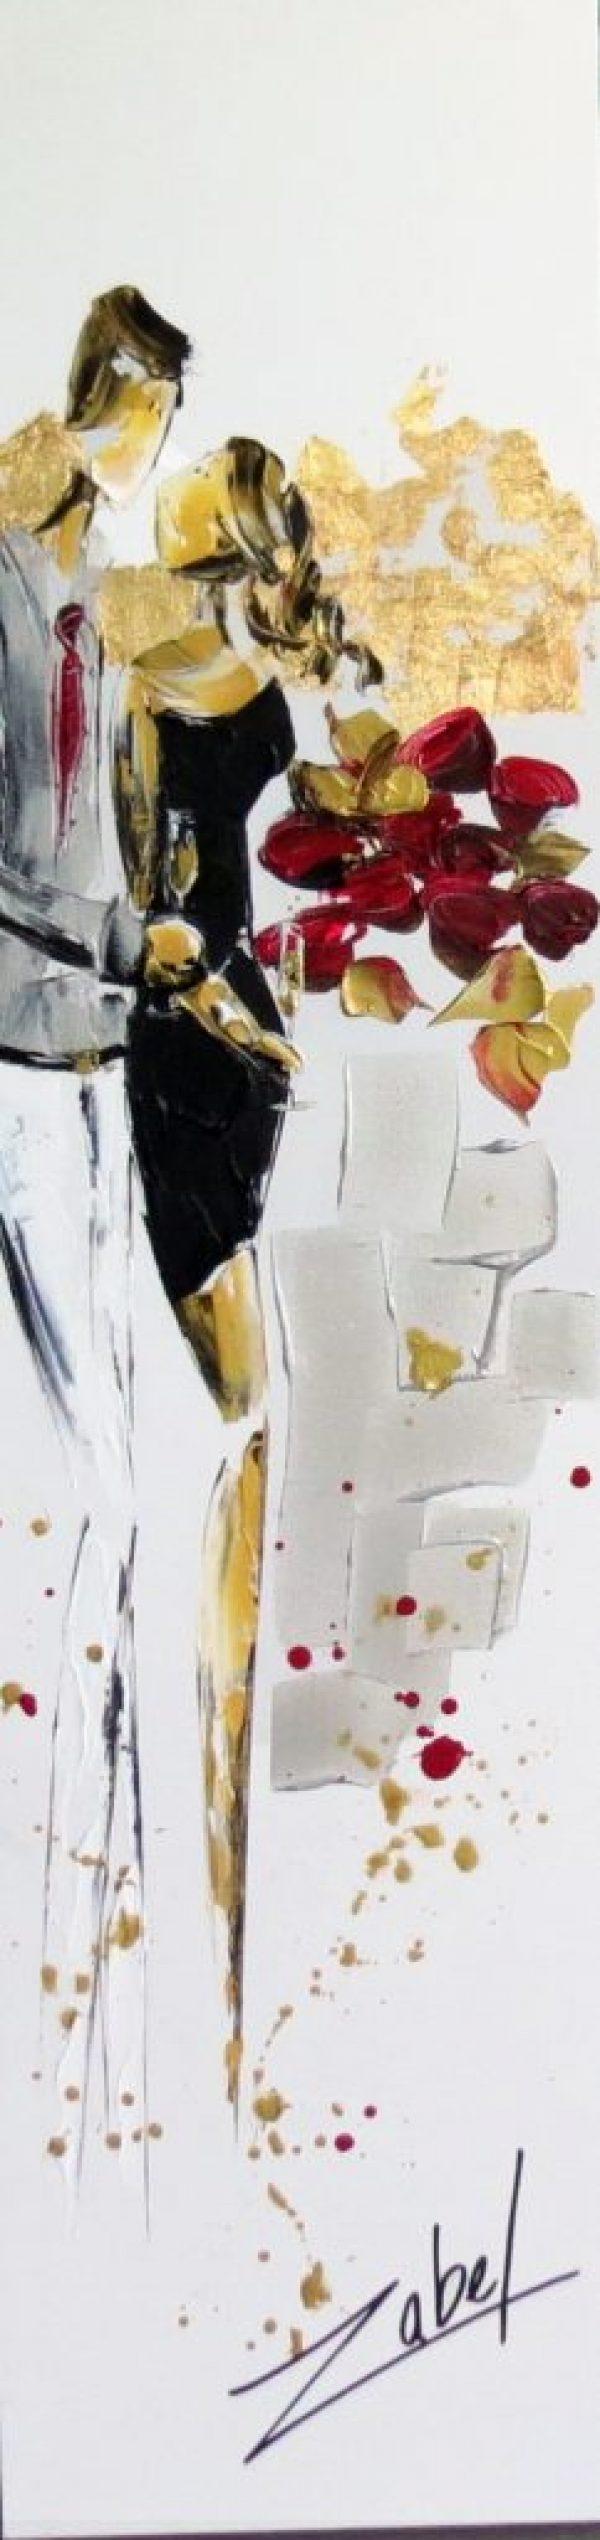 Zabel - Champagne and rose - 12x48